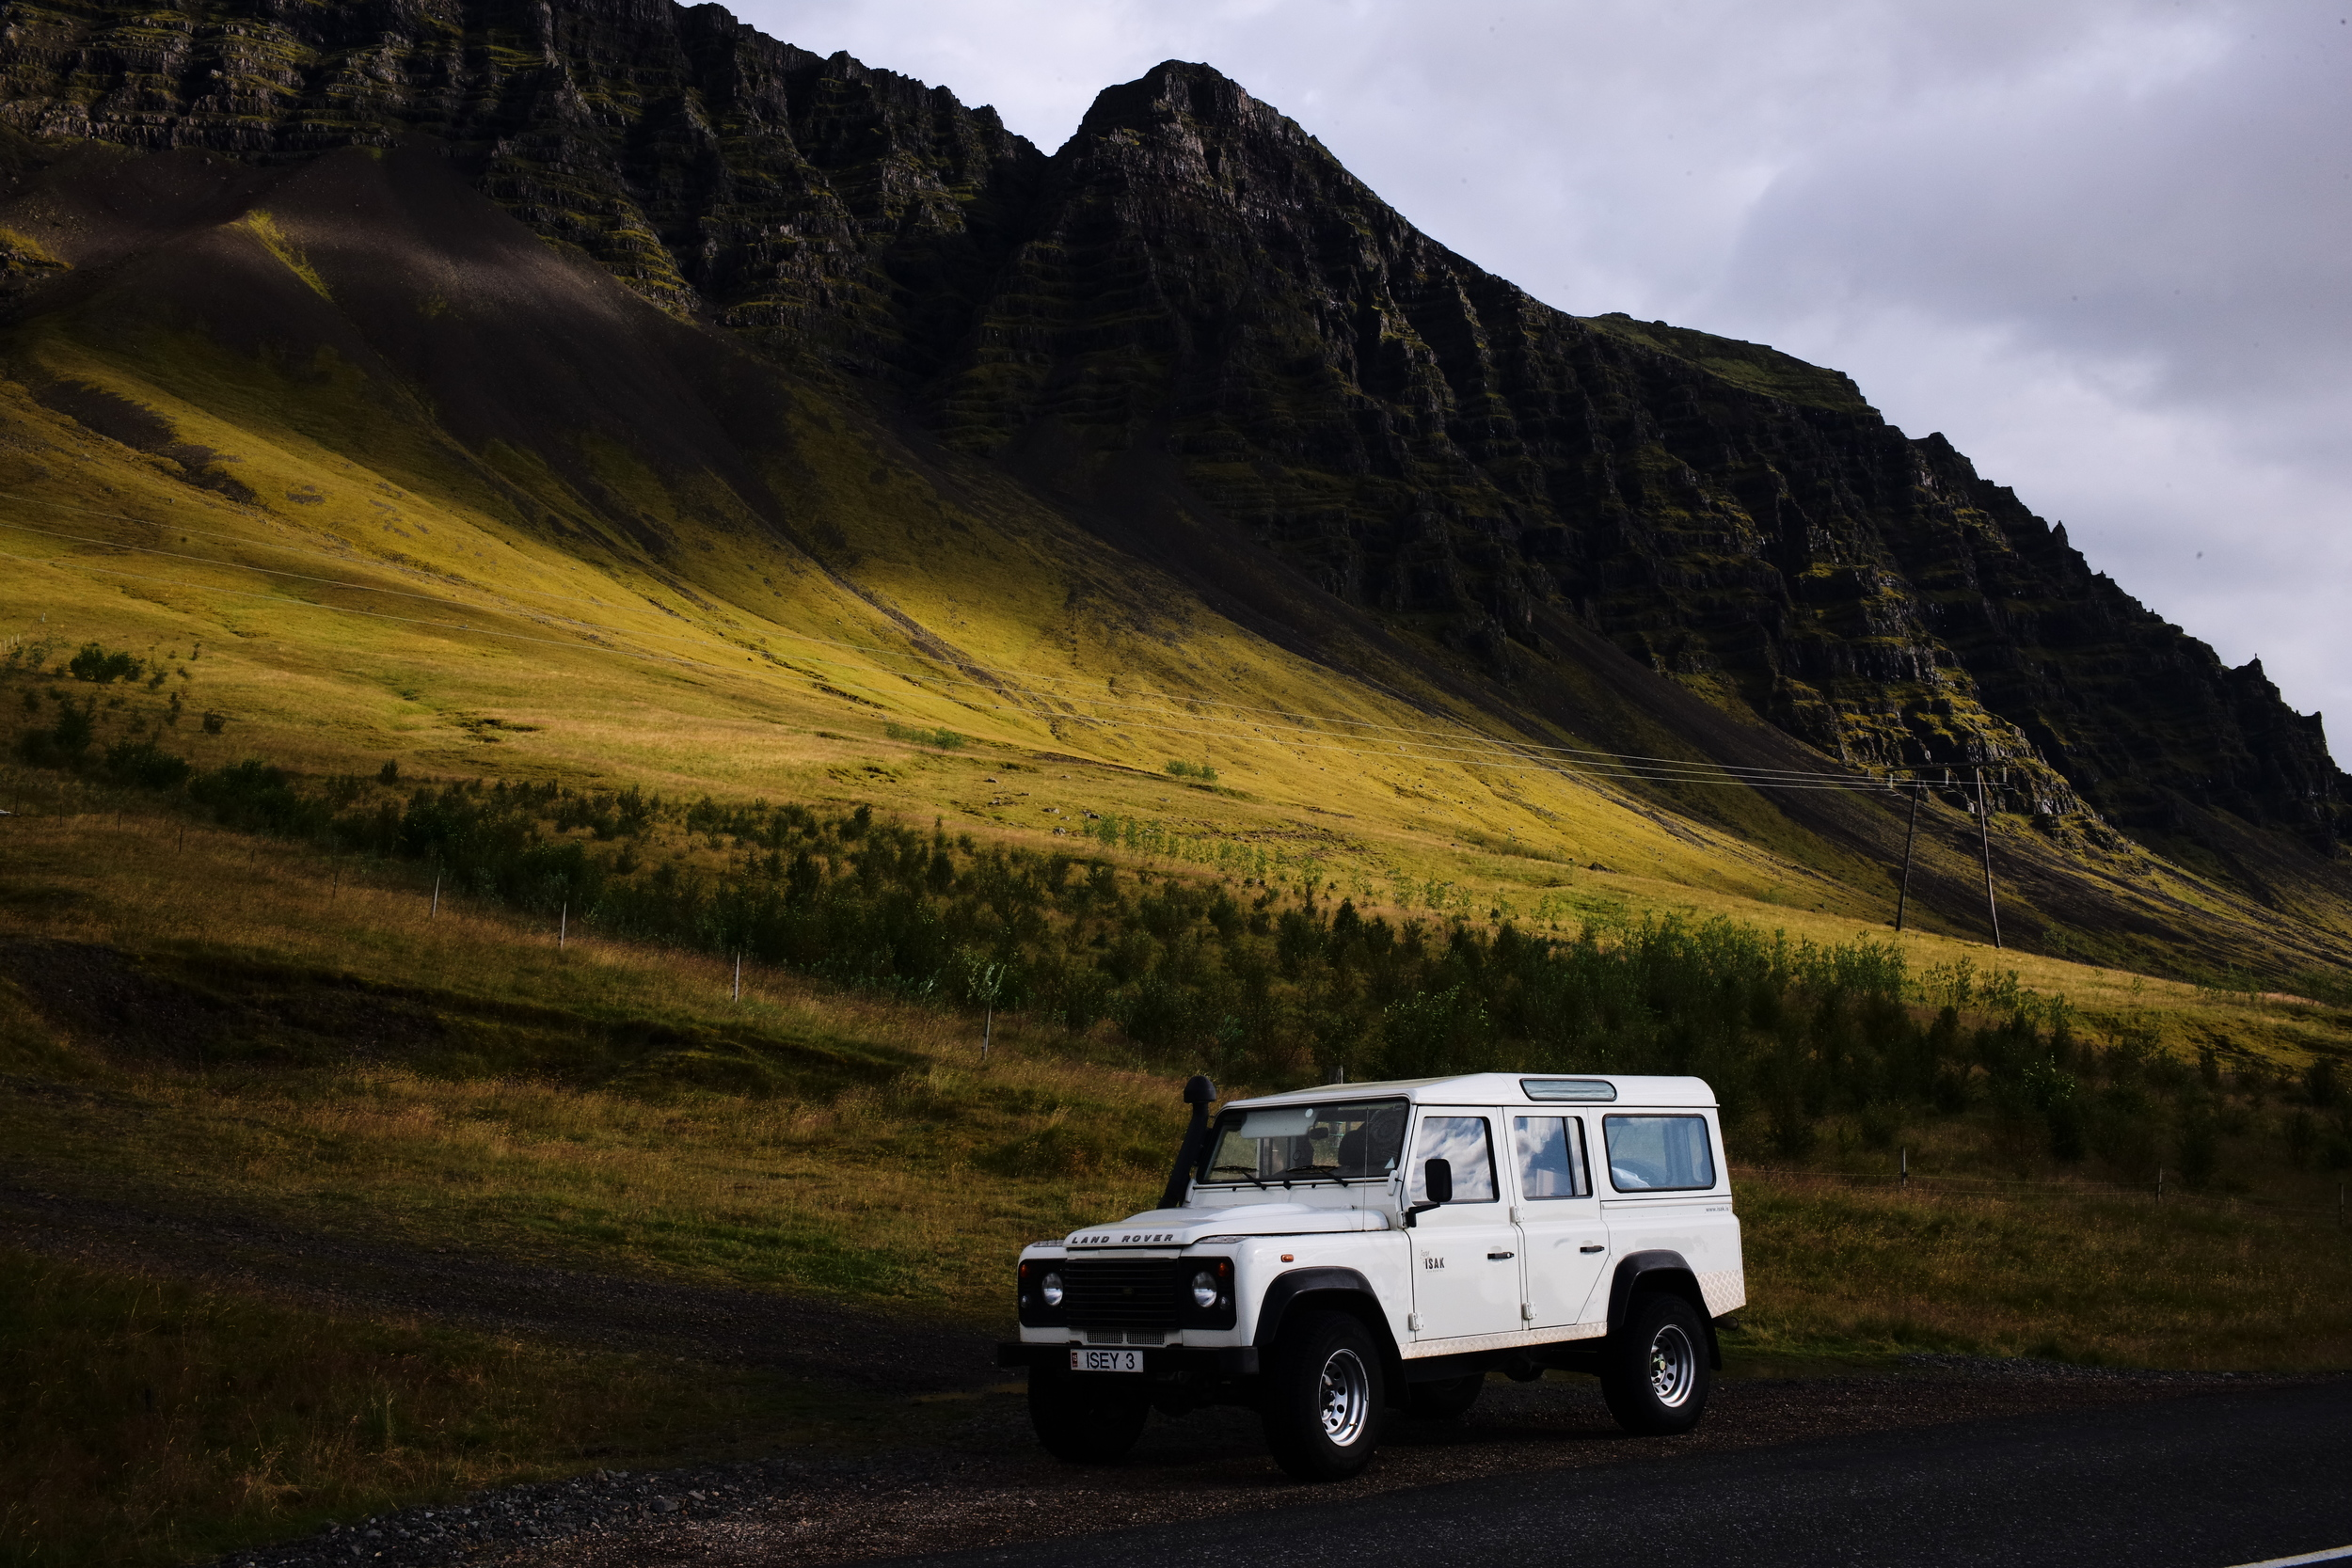 The Ísak jeeps got us around safely